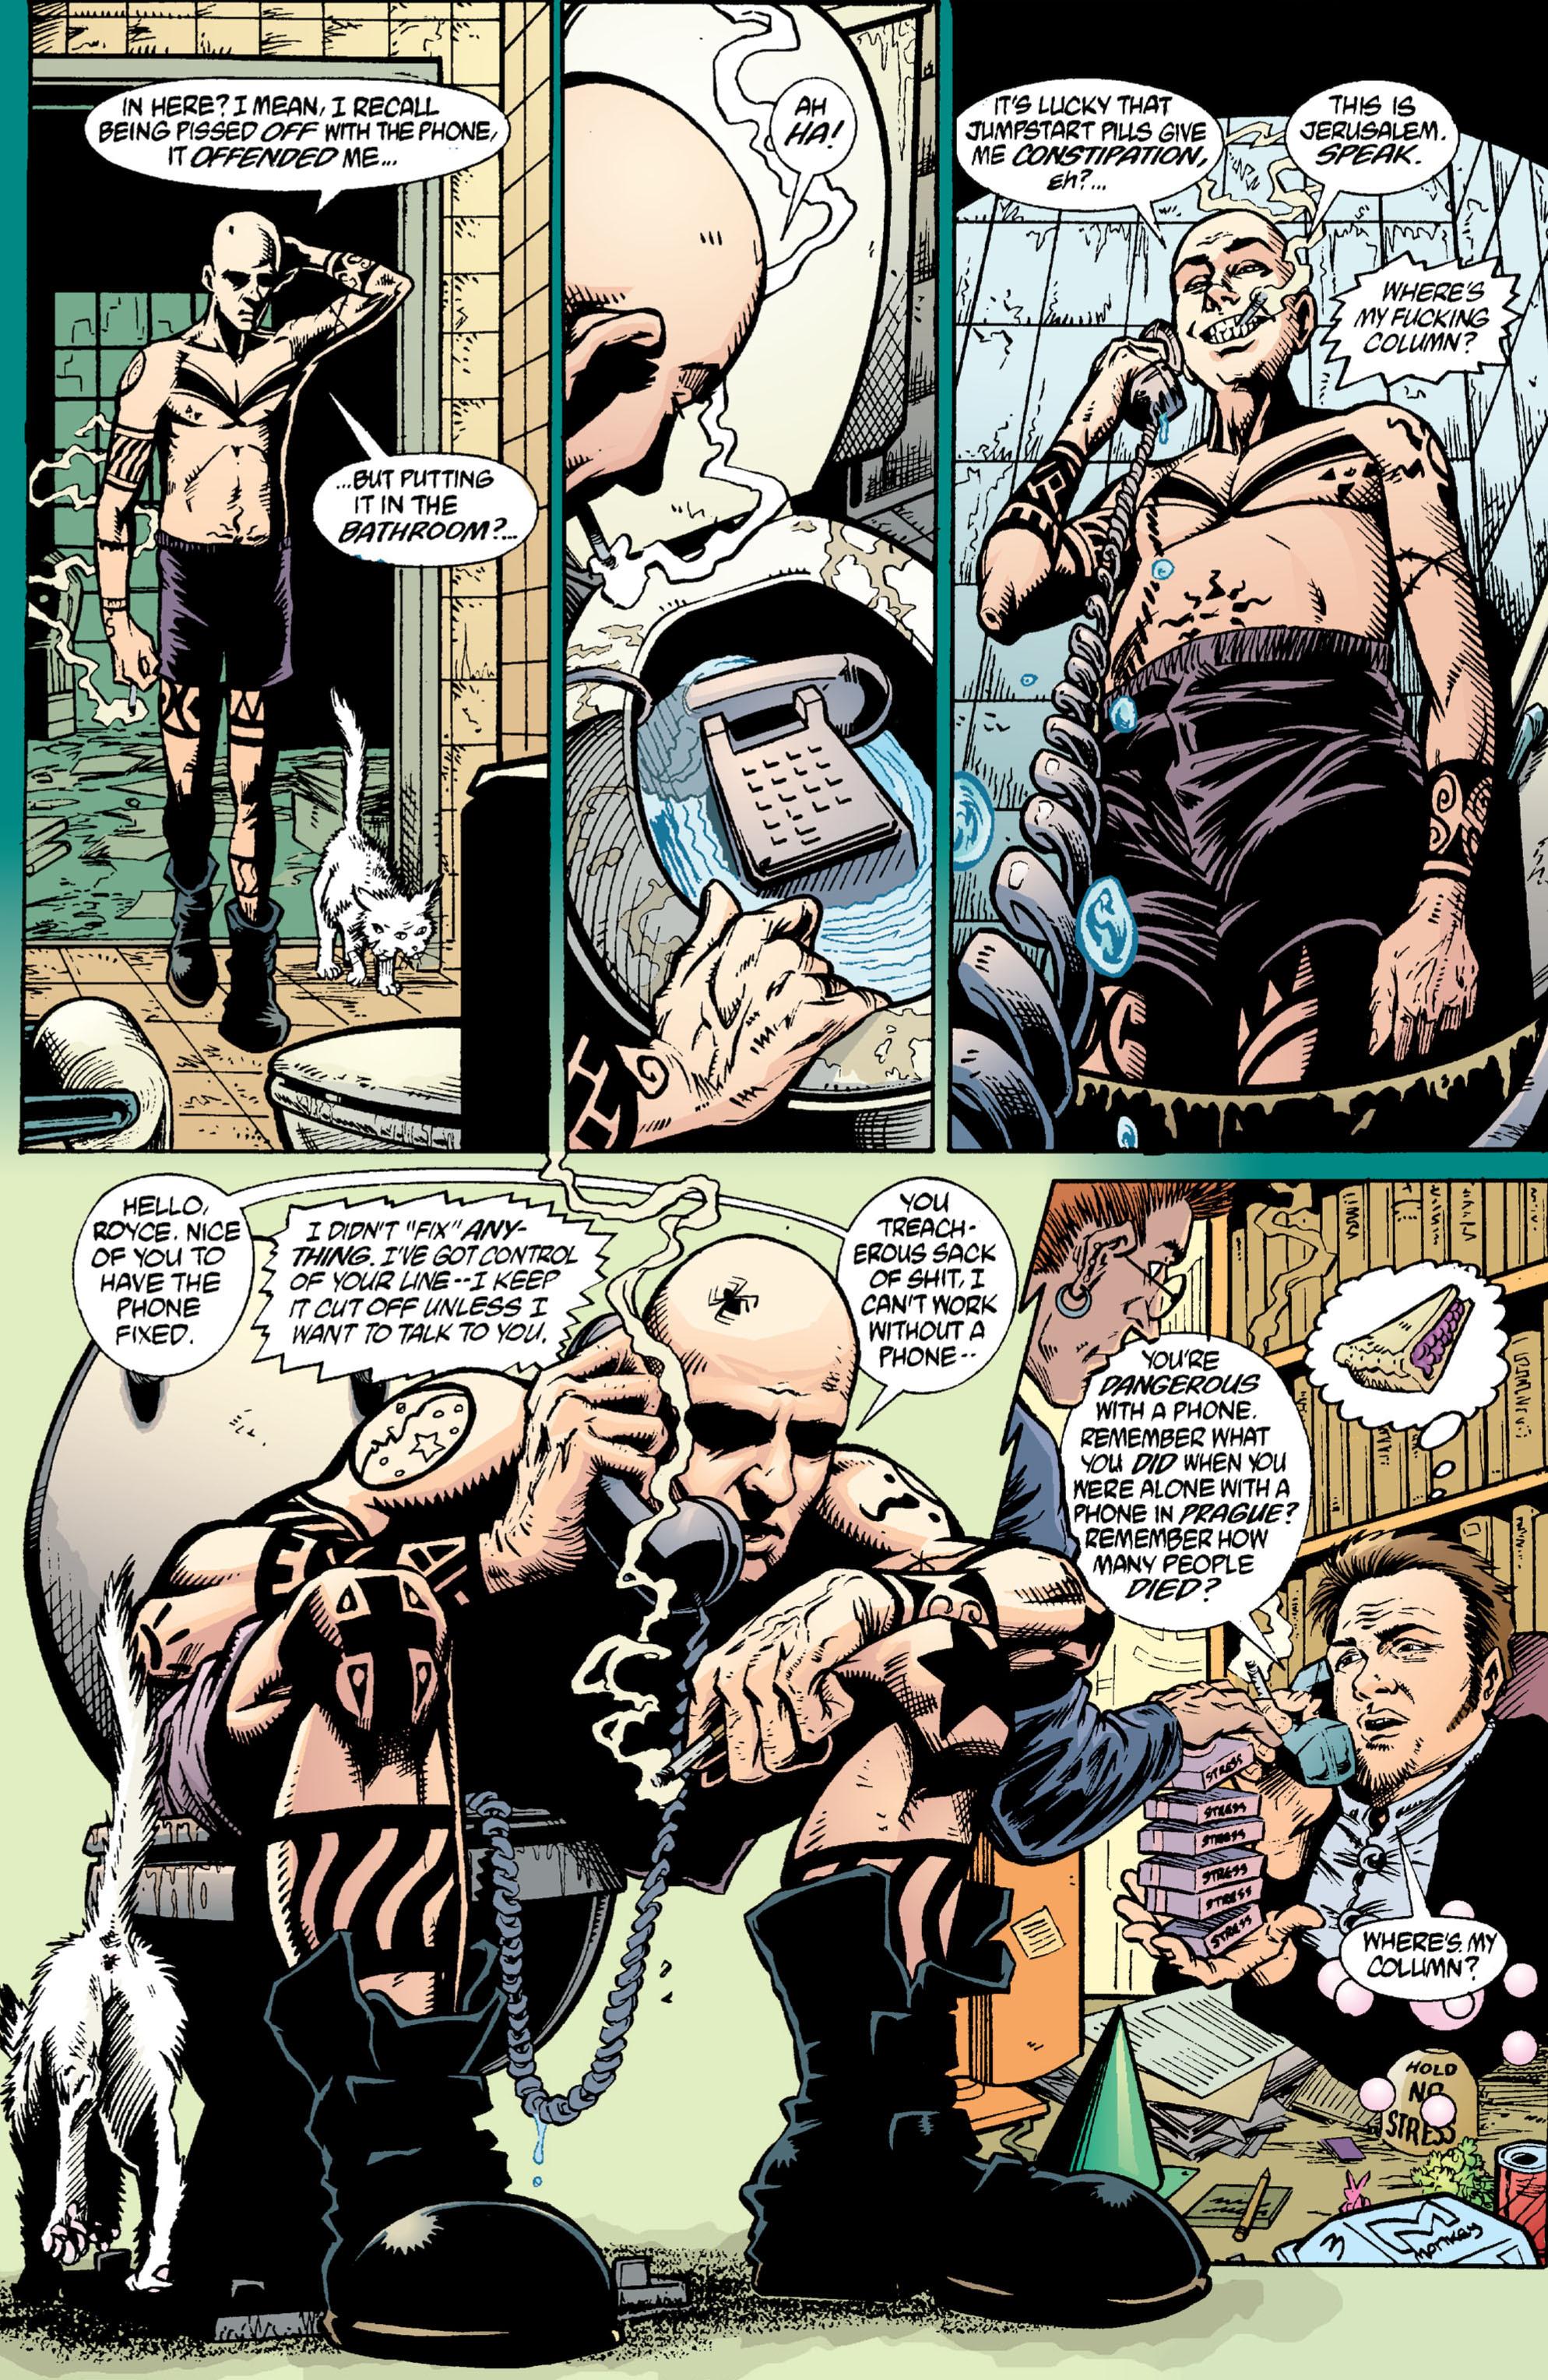 Read online Transmetropolitan comic -  Issue #2 - 20